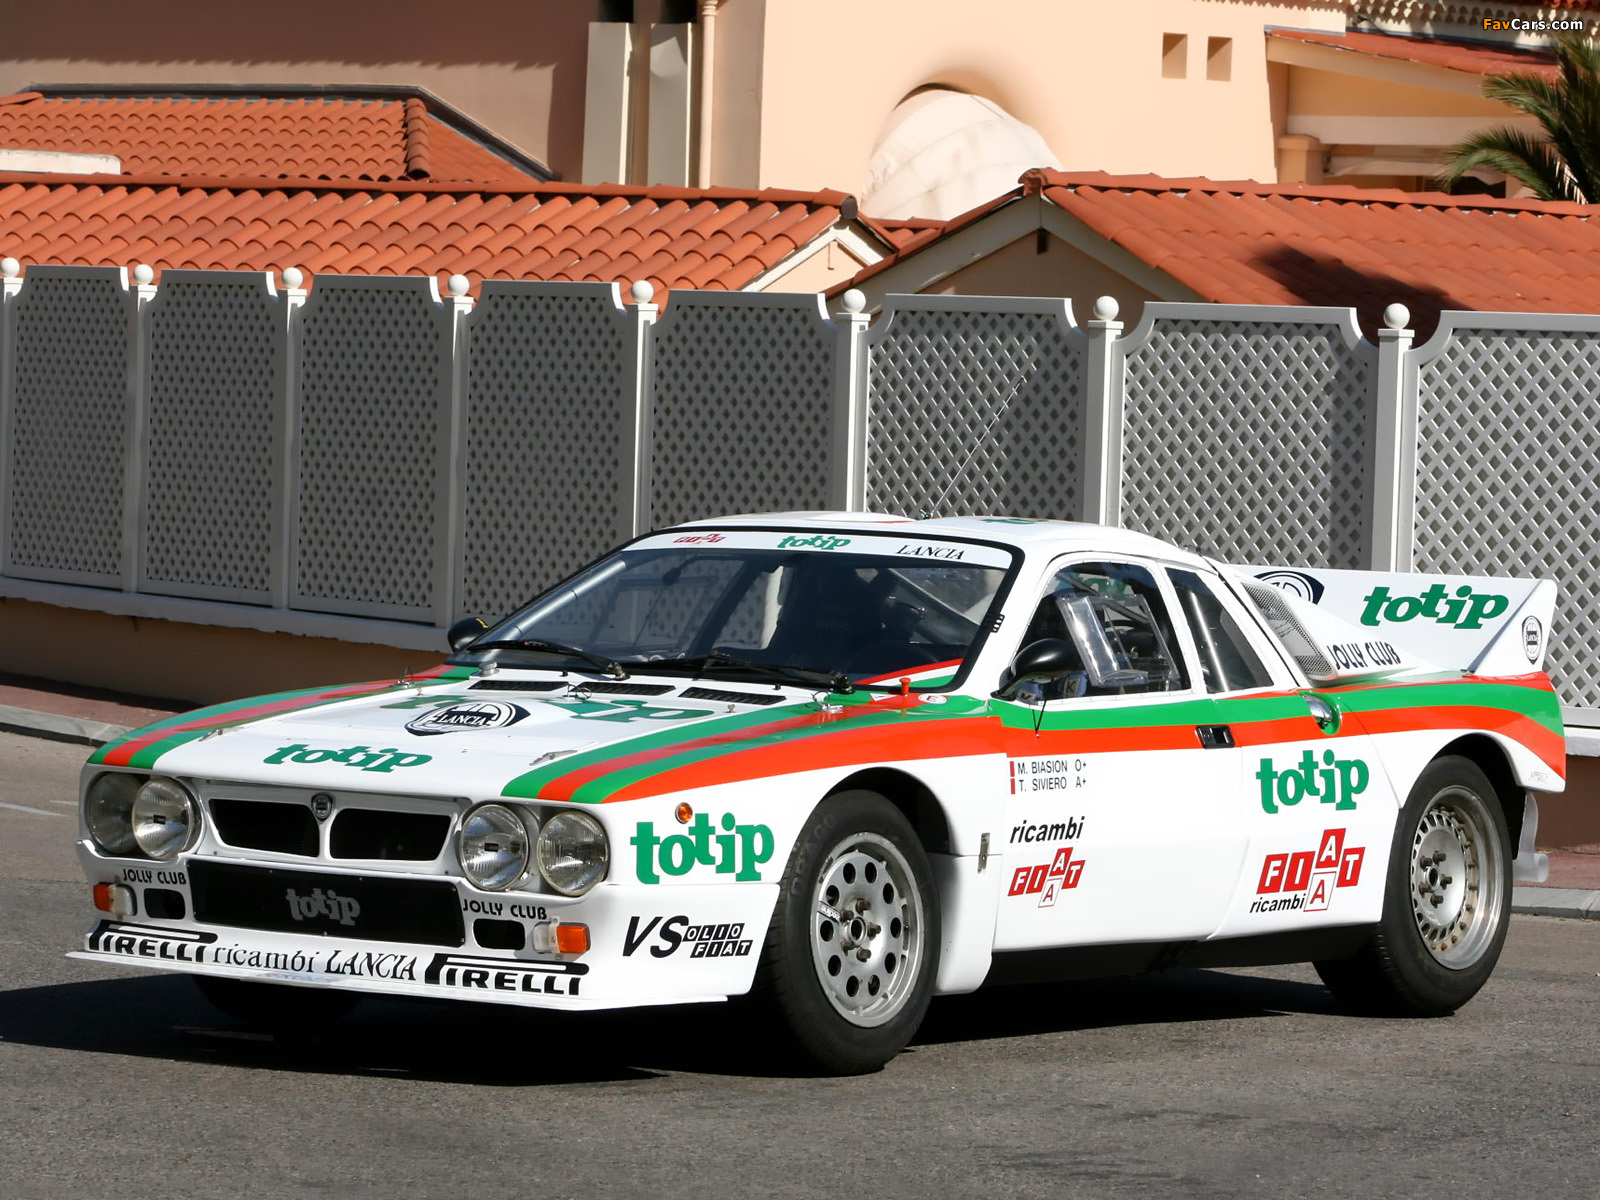 https://img.favcars.com/lancia/rally-037/lancia_rally-037_1982_pictures_1.jpg